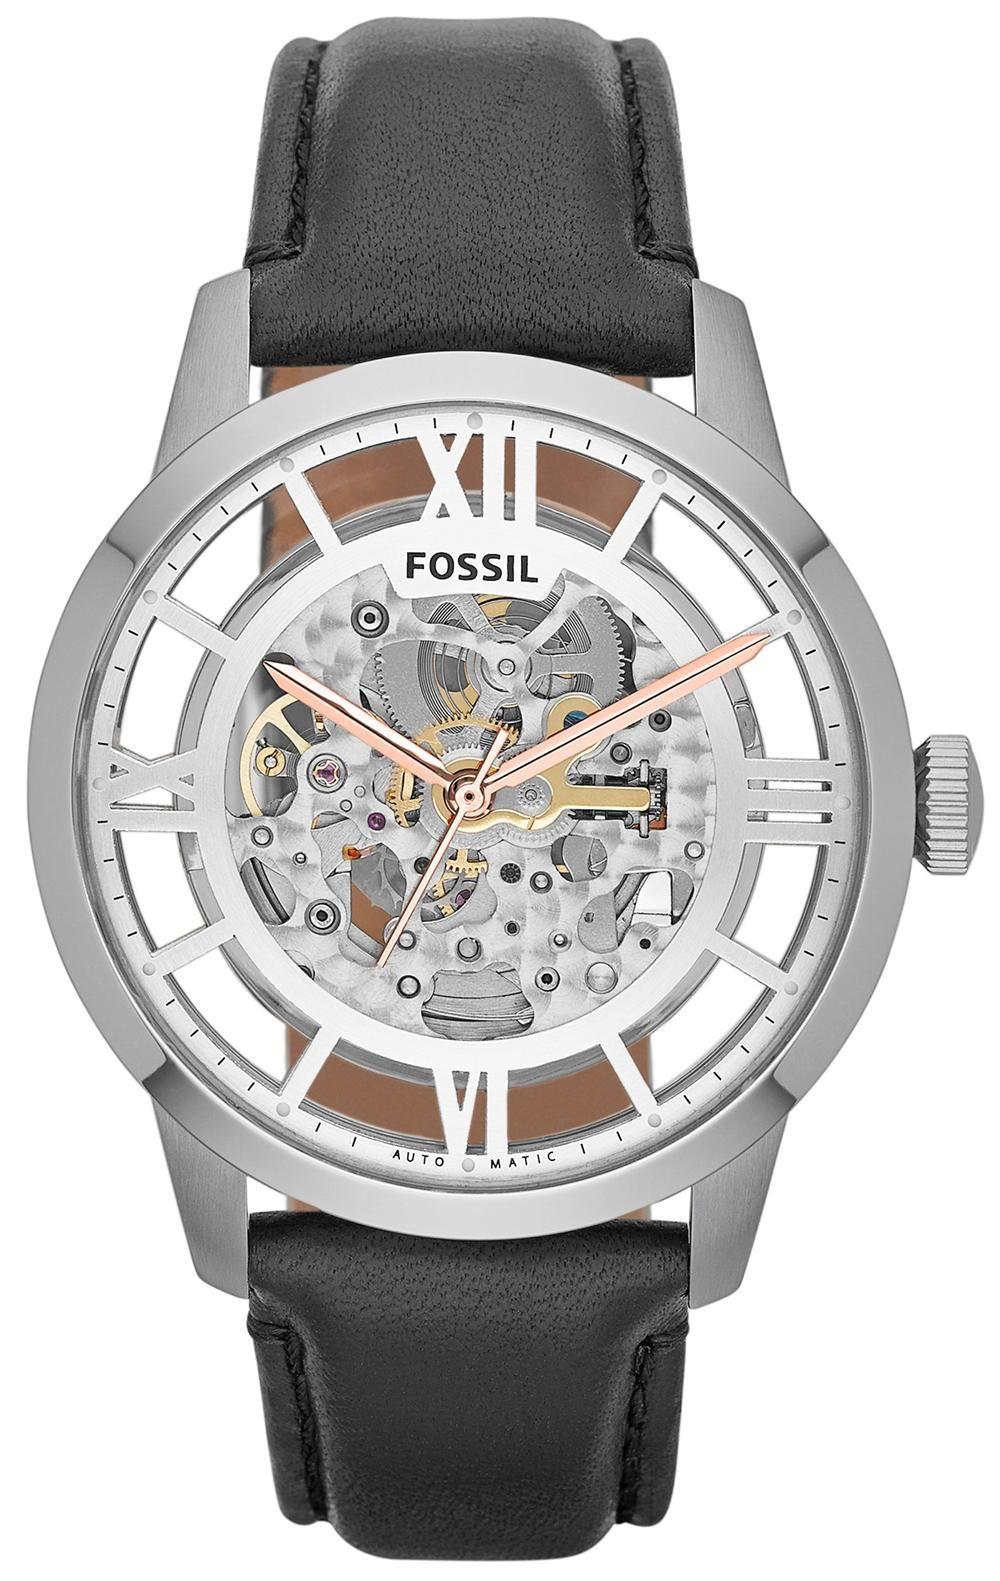 440a3d37ab9f  Fossil  Watches exclusively at  CapriJewelersArizona ~  www.caprijewelersaz.com ♥ Fossil ME3041 Townsman Skeleton Automatic